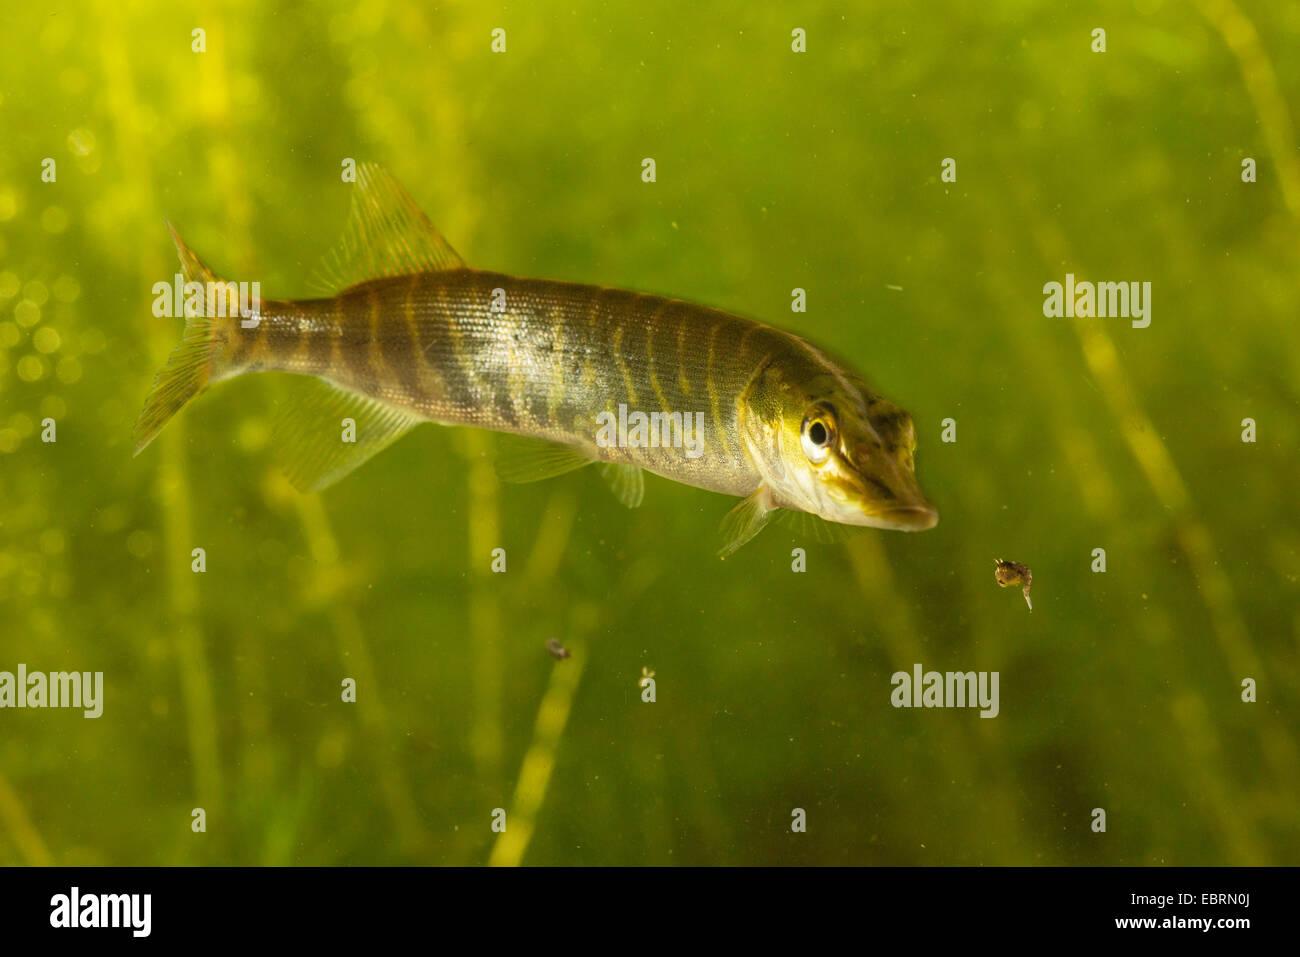 Hecht, Hecht (Esox Lucius), Jagd Mückenlarven, Deutschland Stockbild